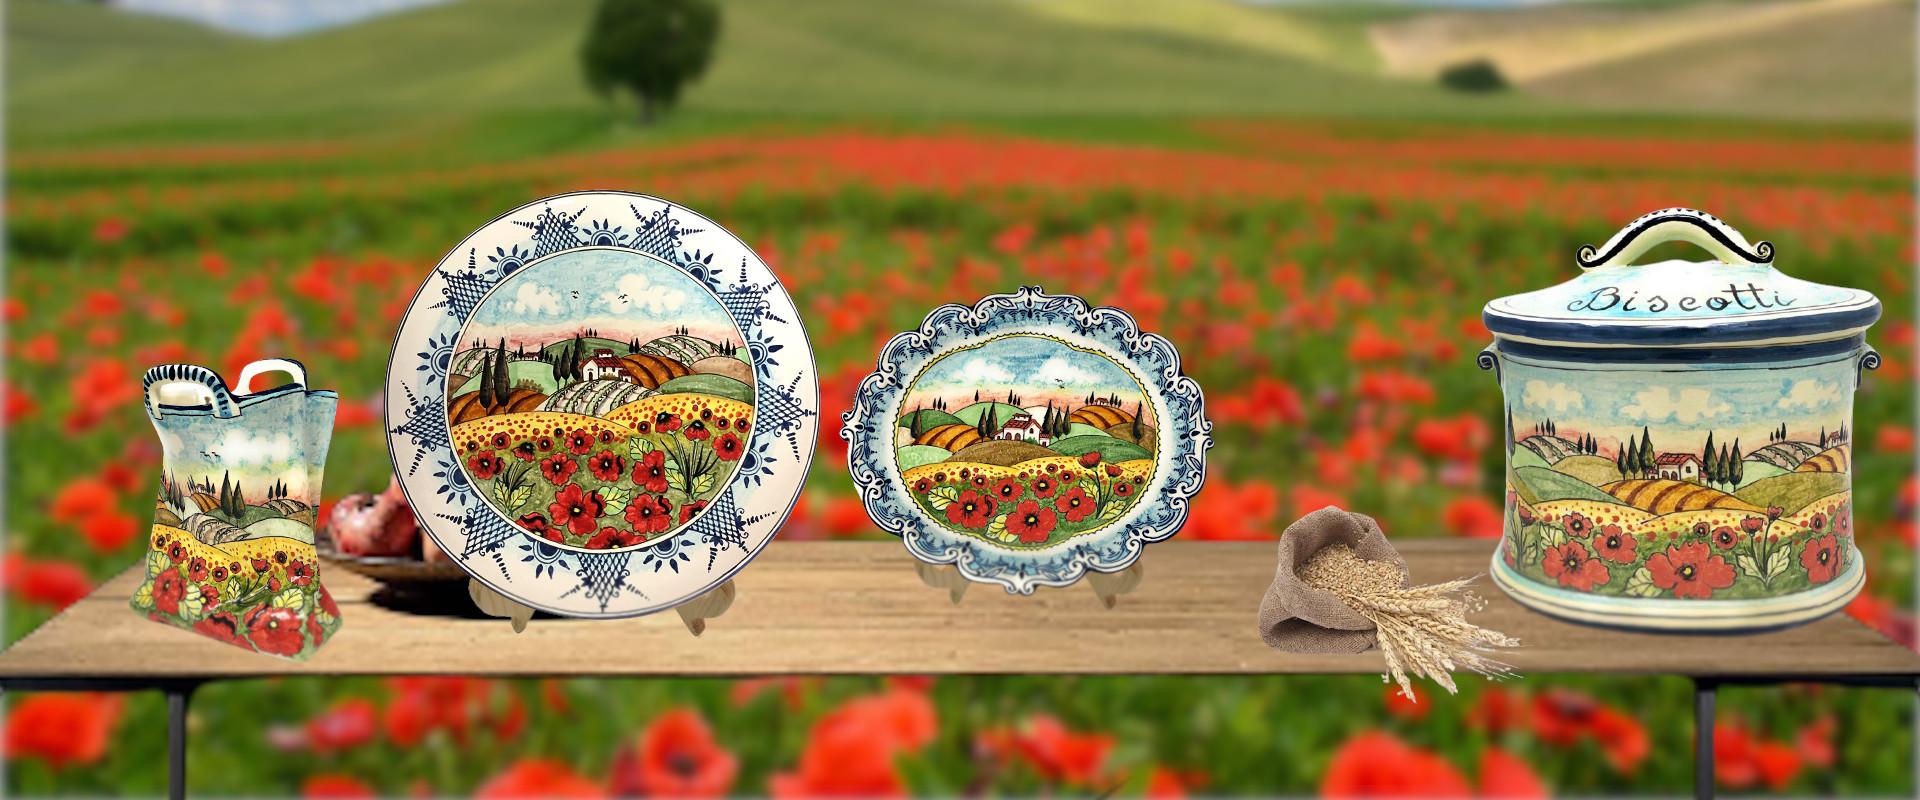 Landscape Poppies